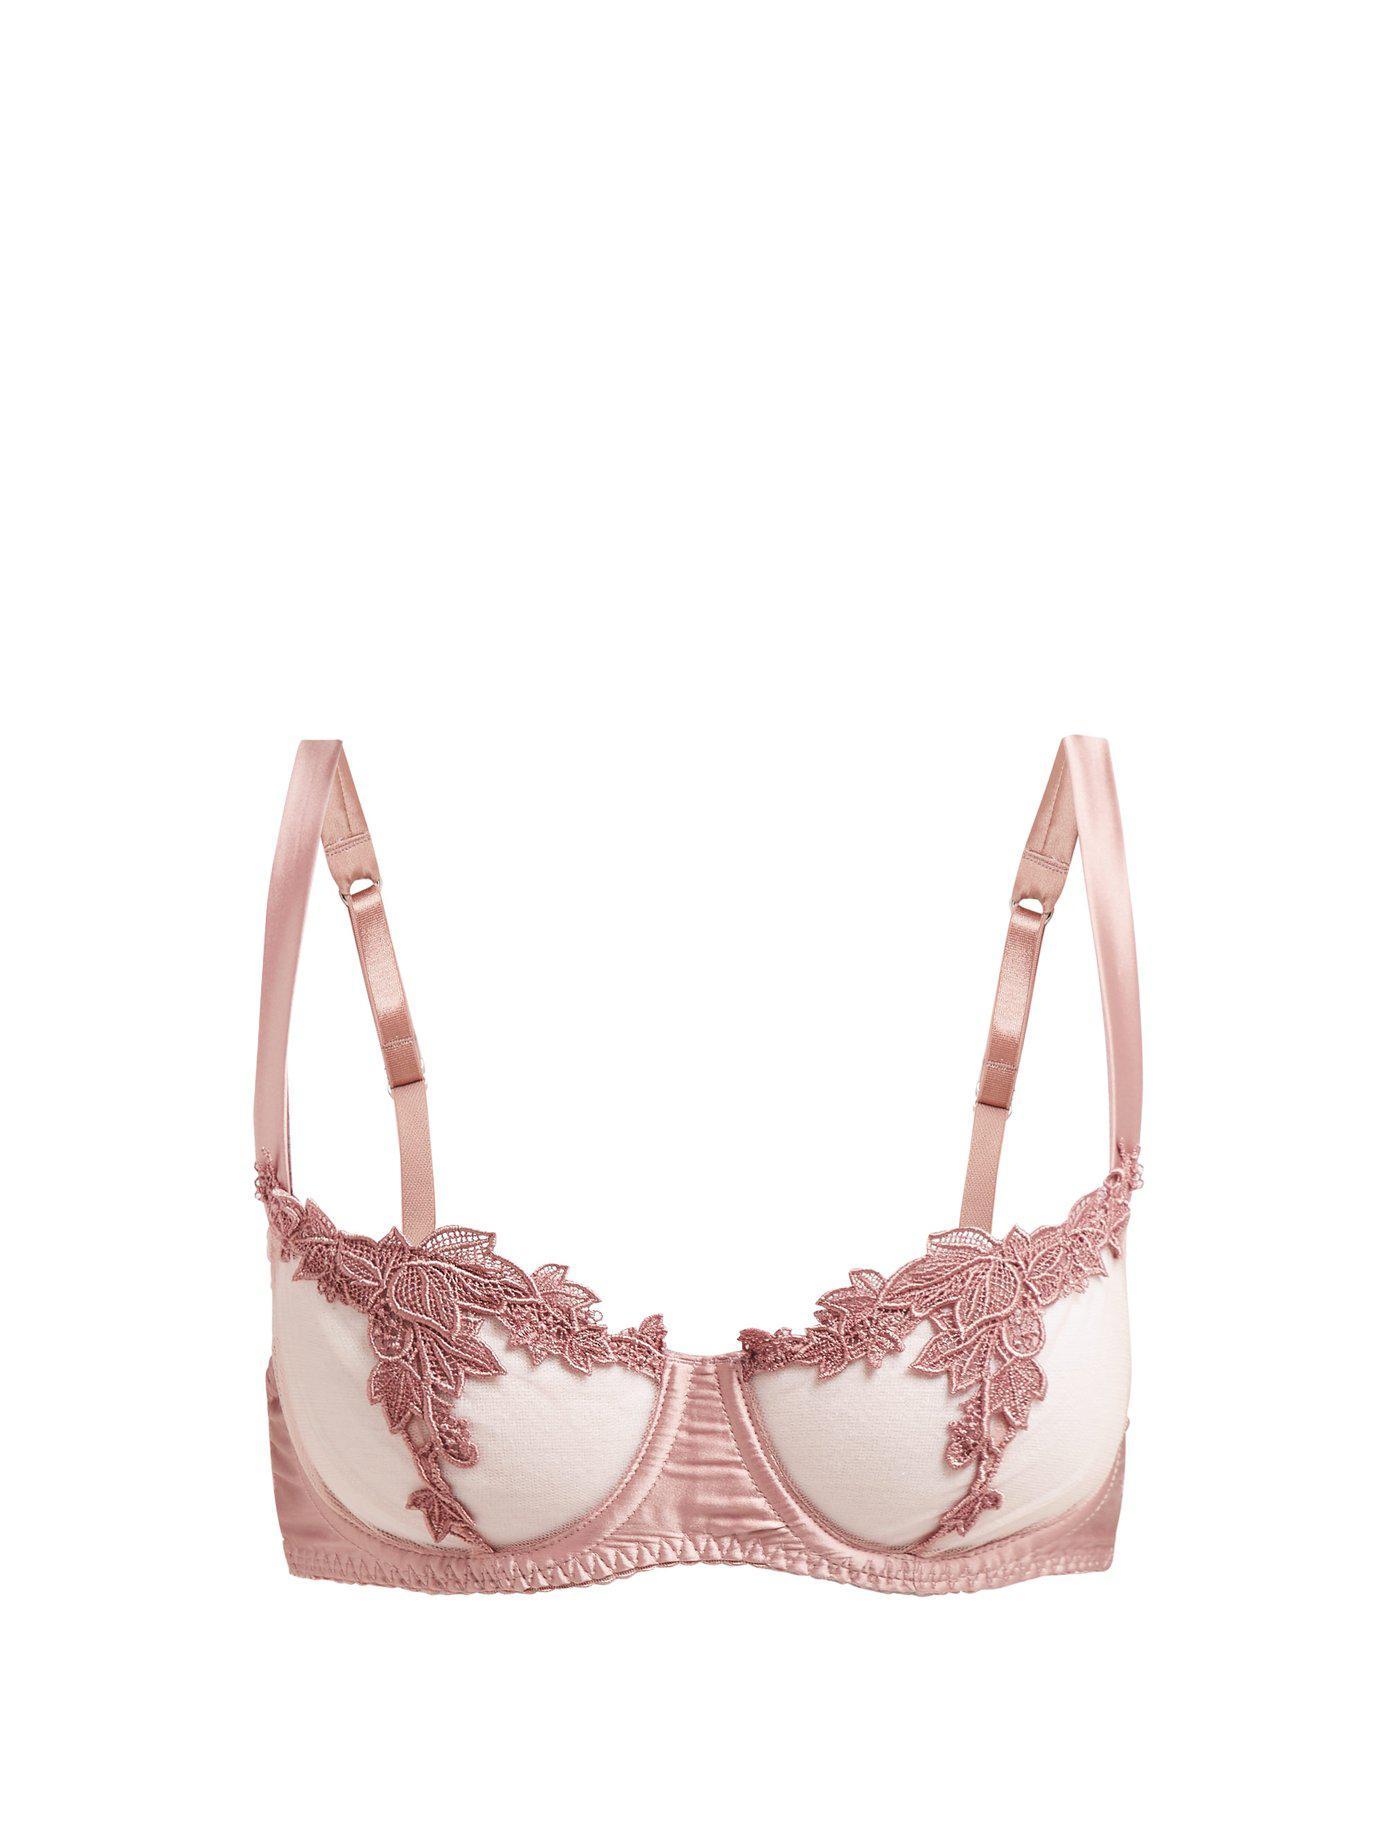 9a725433fd Lyst - Fleur Of England Desert Rose Balcony Bra in Pink - Save 15%